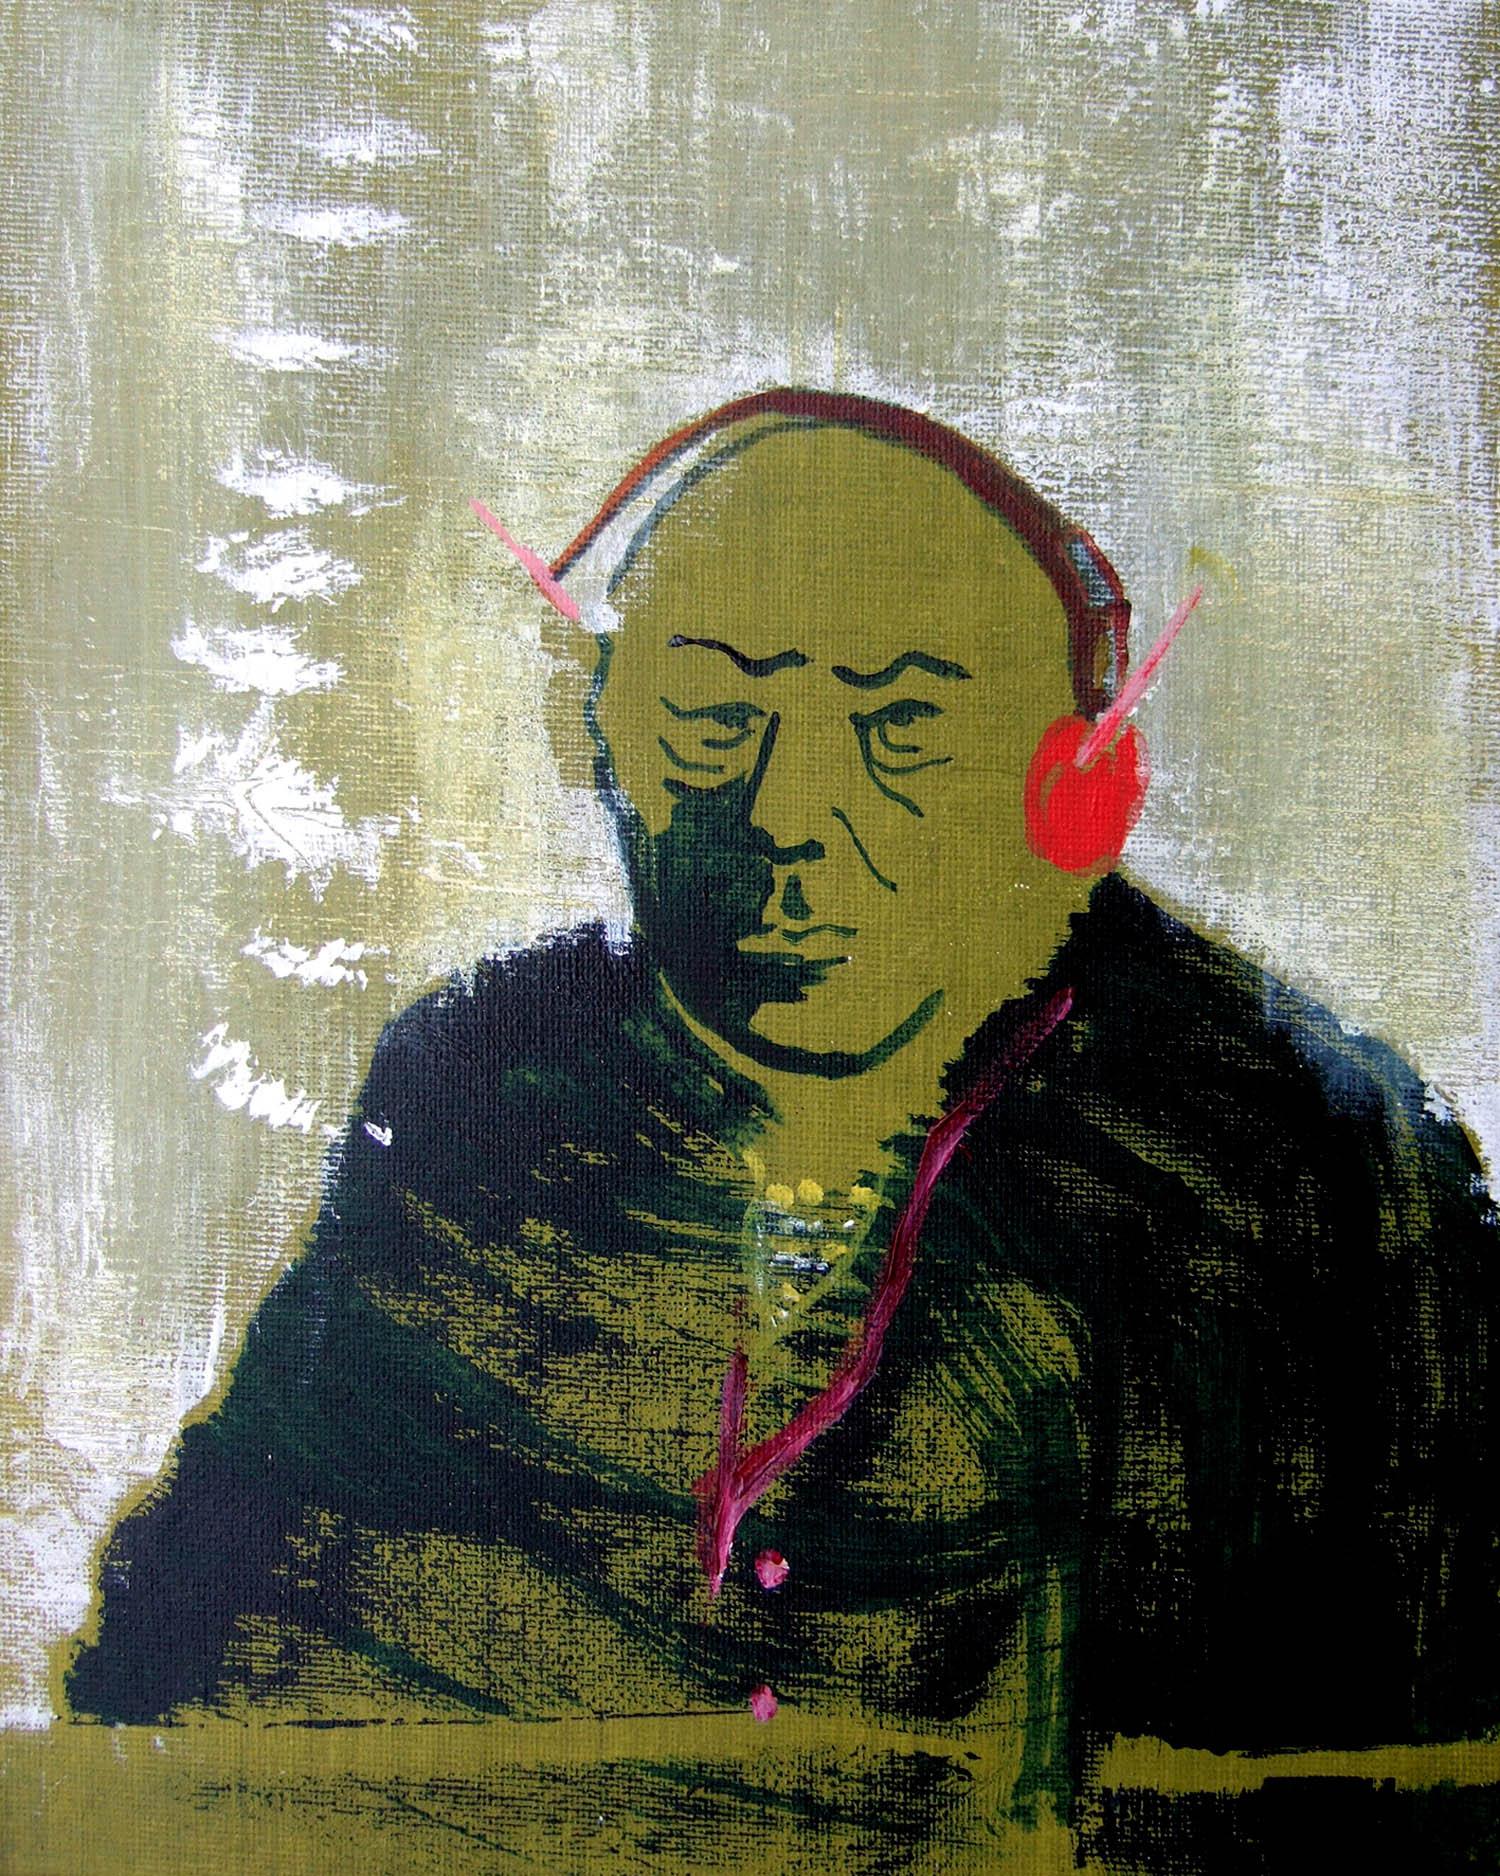 Roger-Roger (2010), acrylic on canvas, 25.4 x 20.3cm